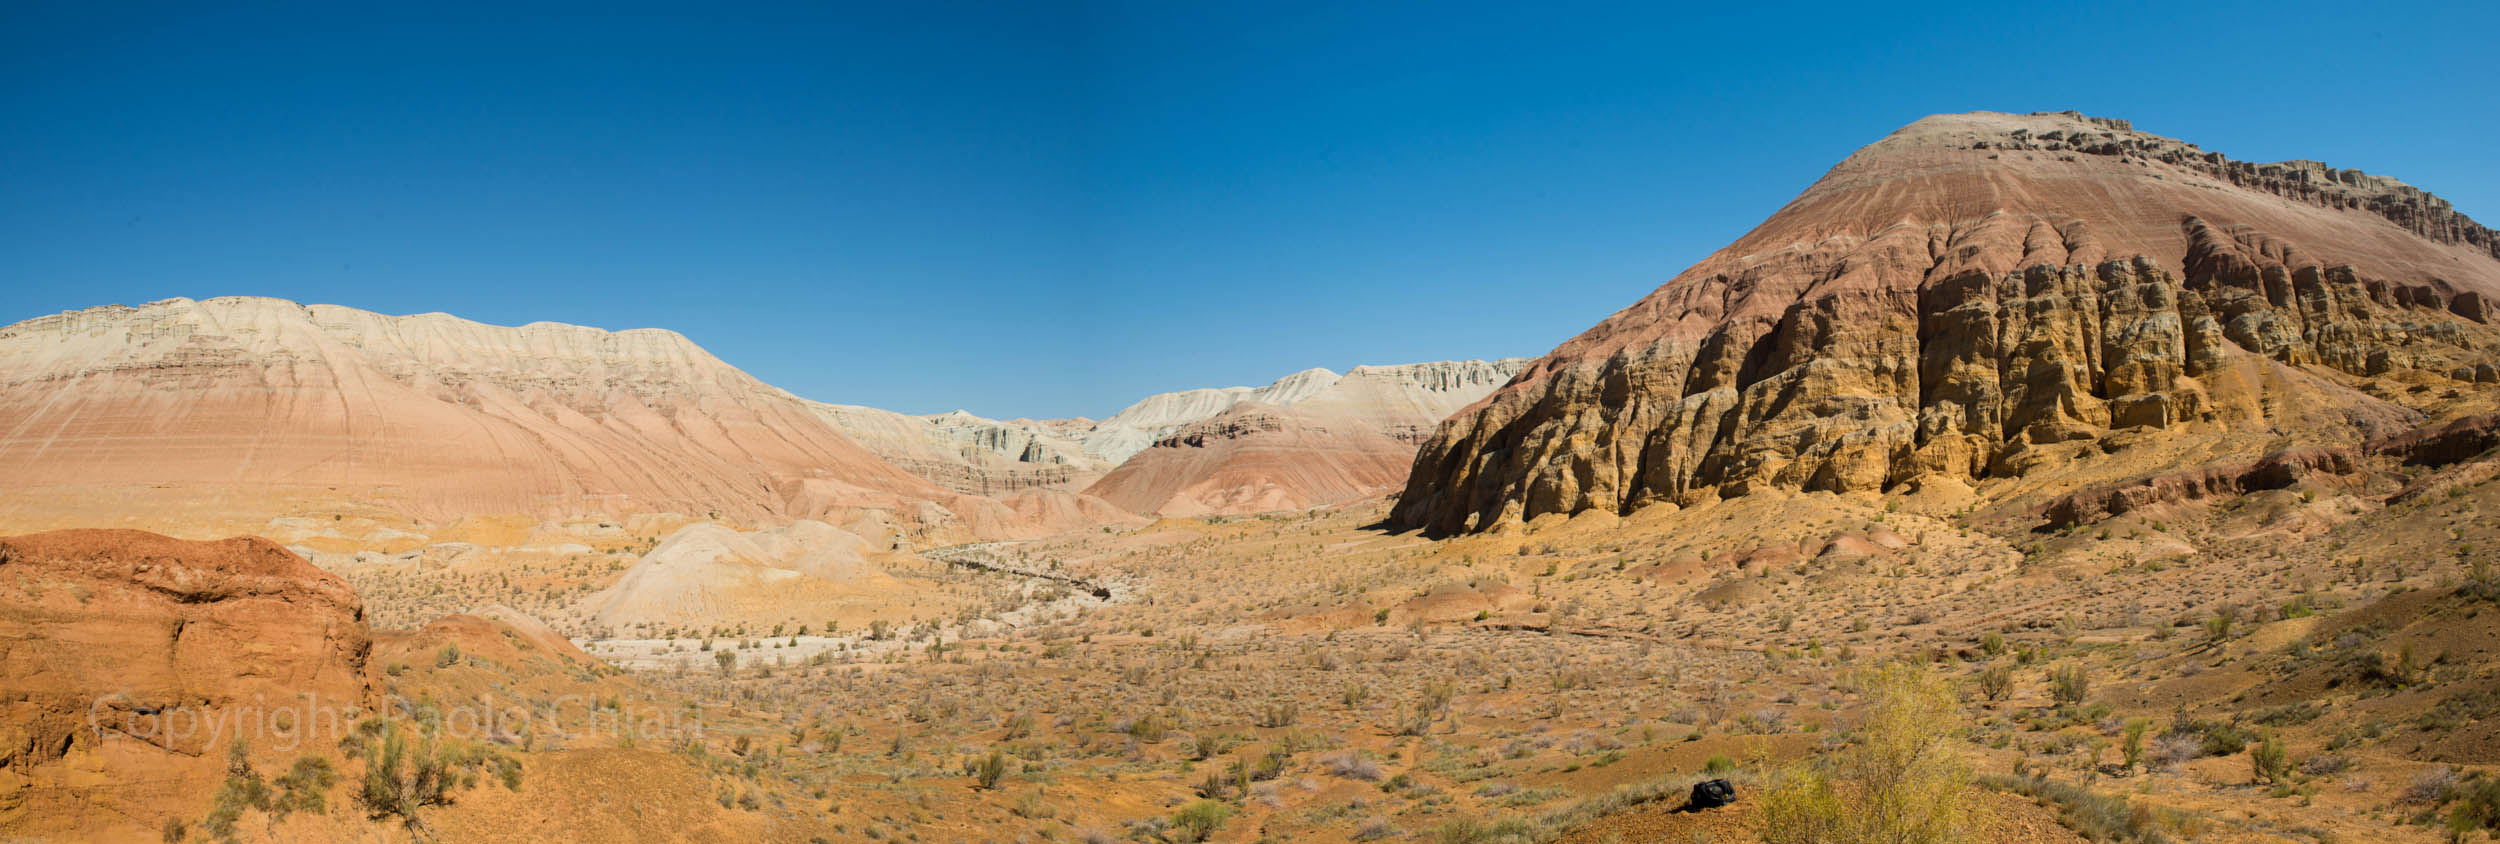 Panoramica_deserto1